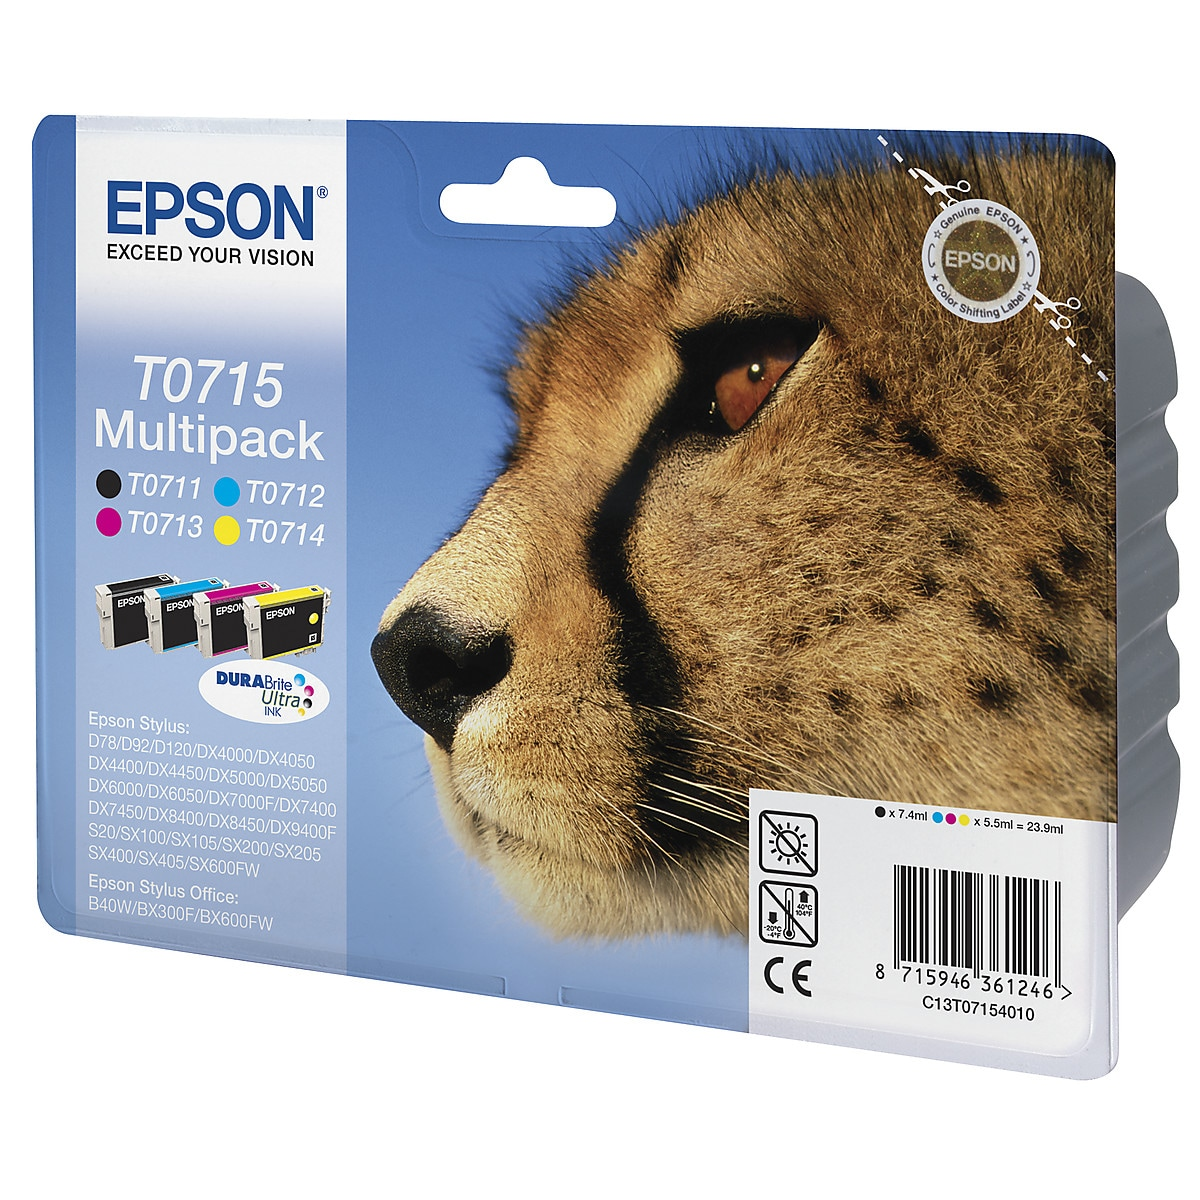 Bläckpatron Epson T0711 till T0715